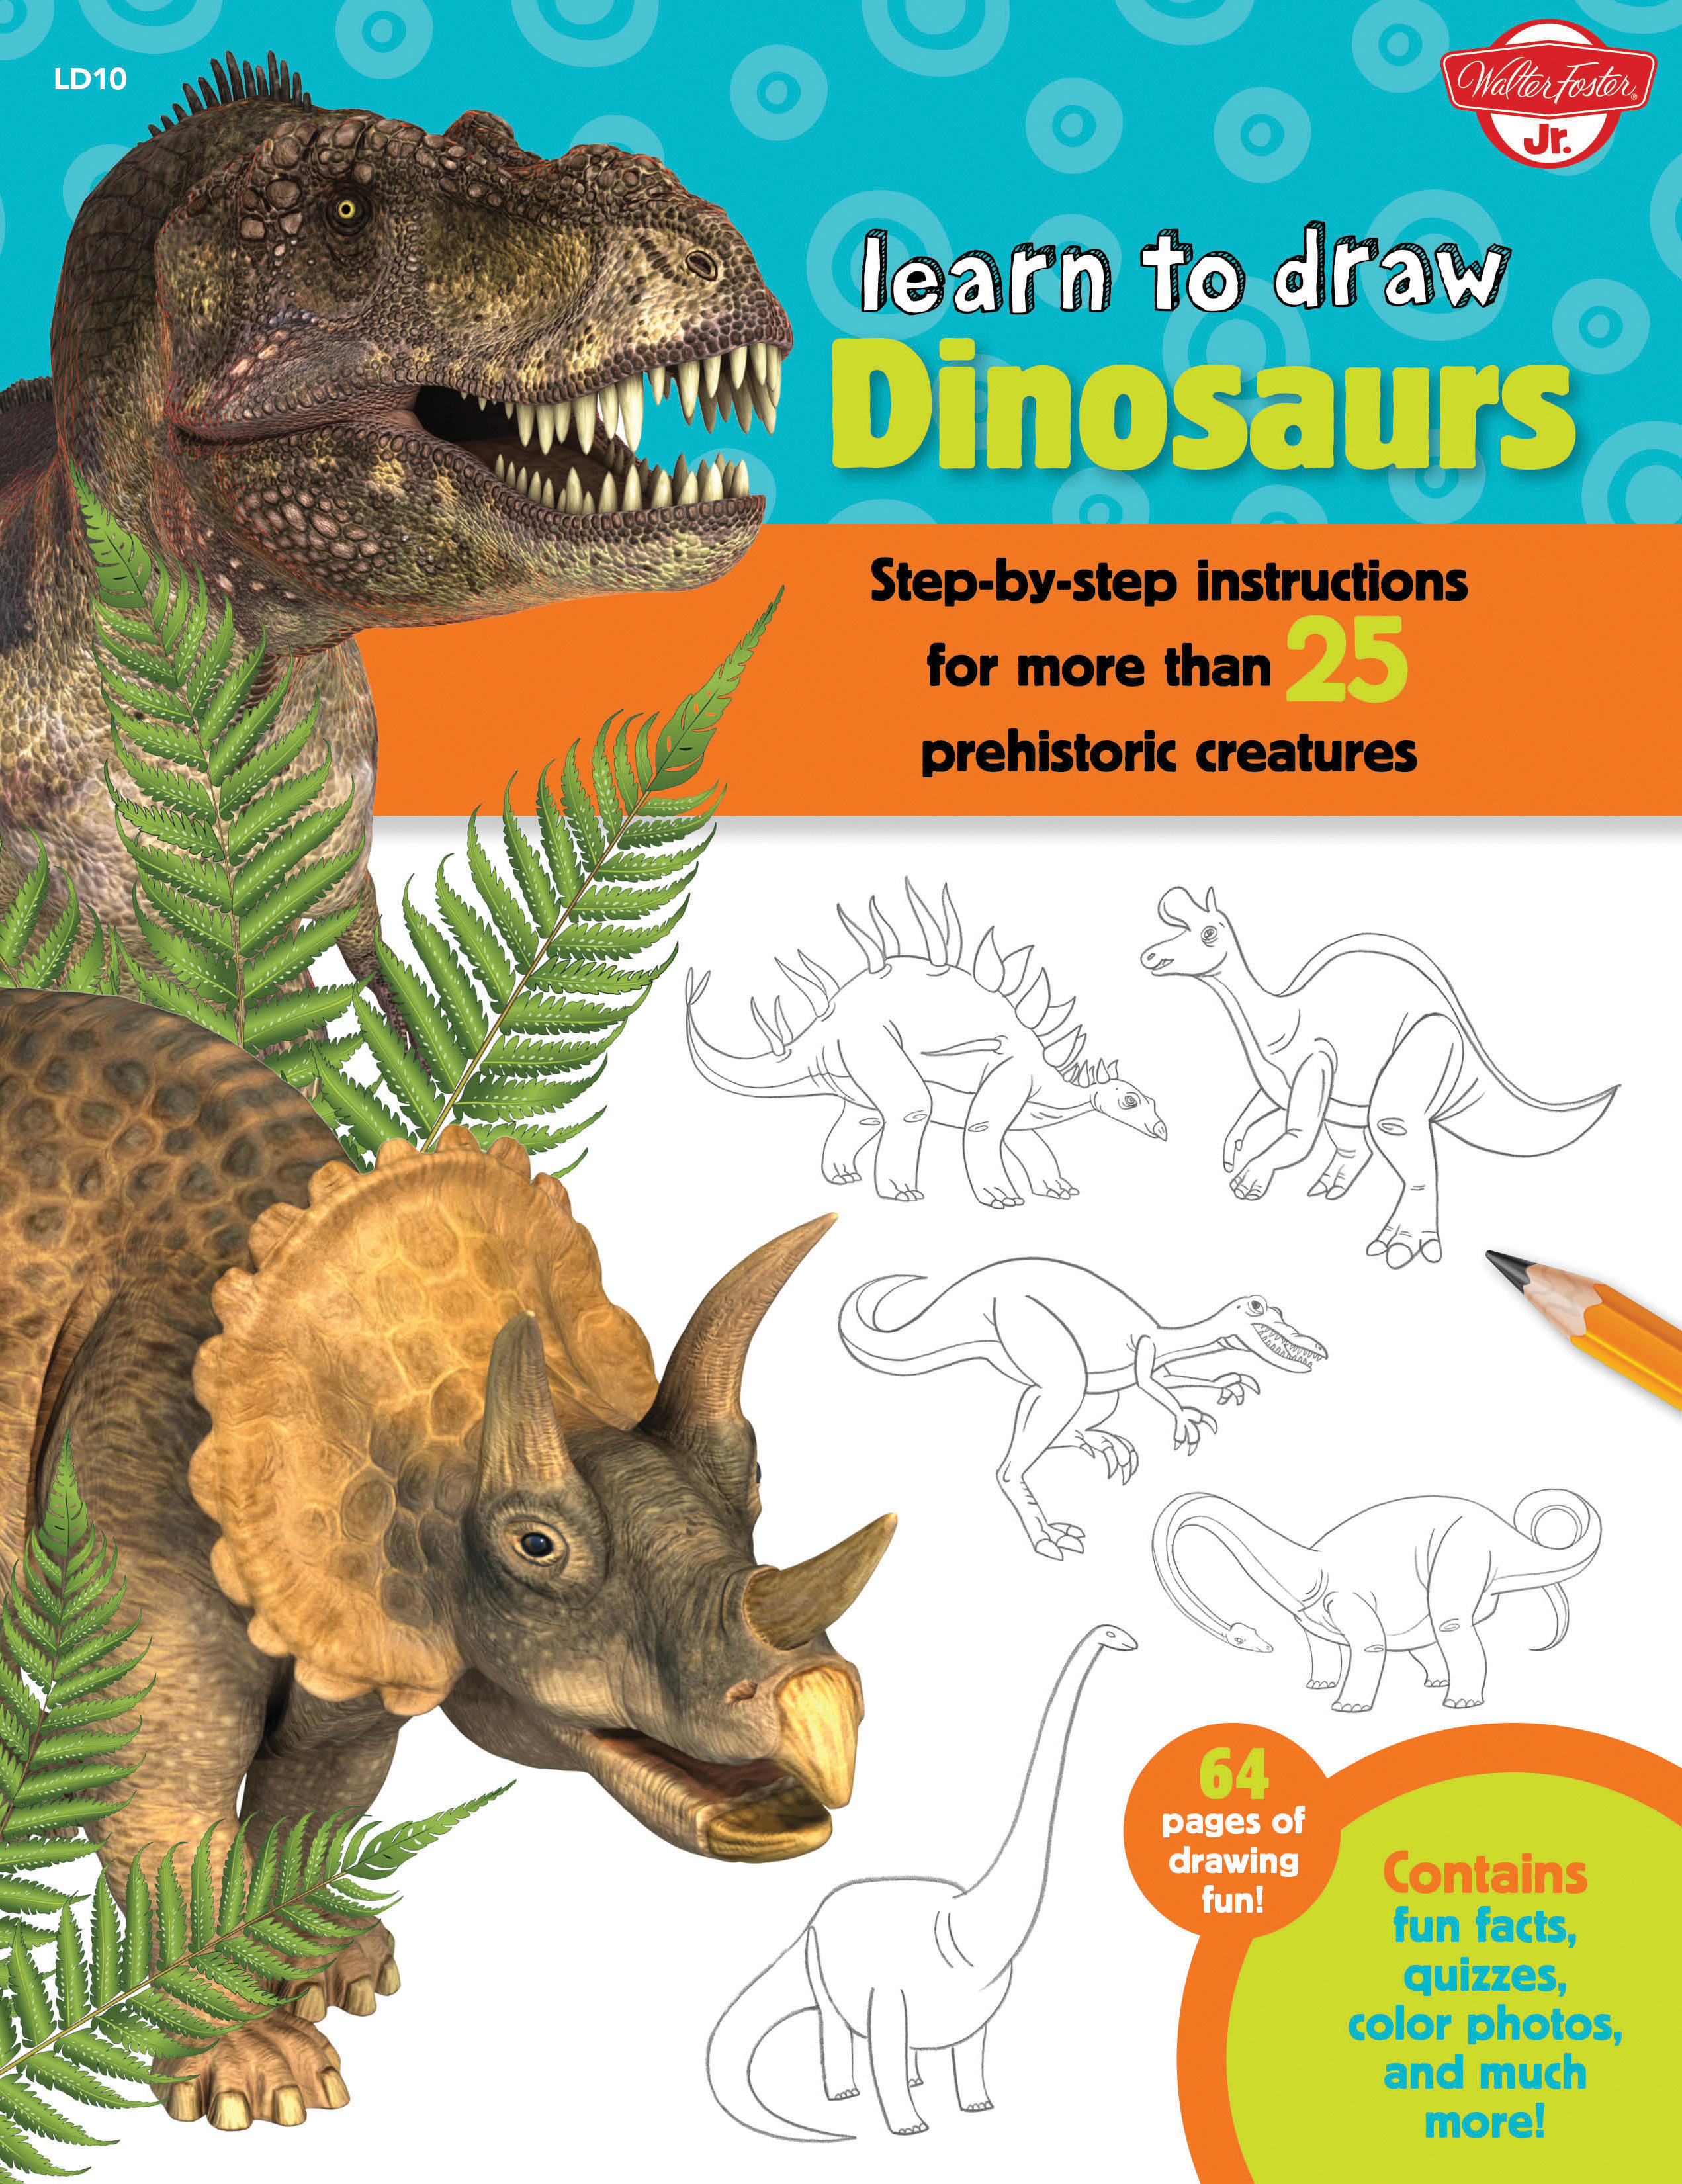 Dinosaurs Learn To Draw Robbin Cuddy 9781633220300